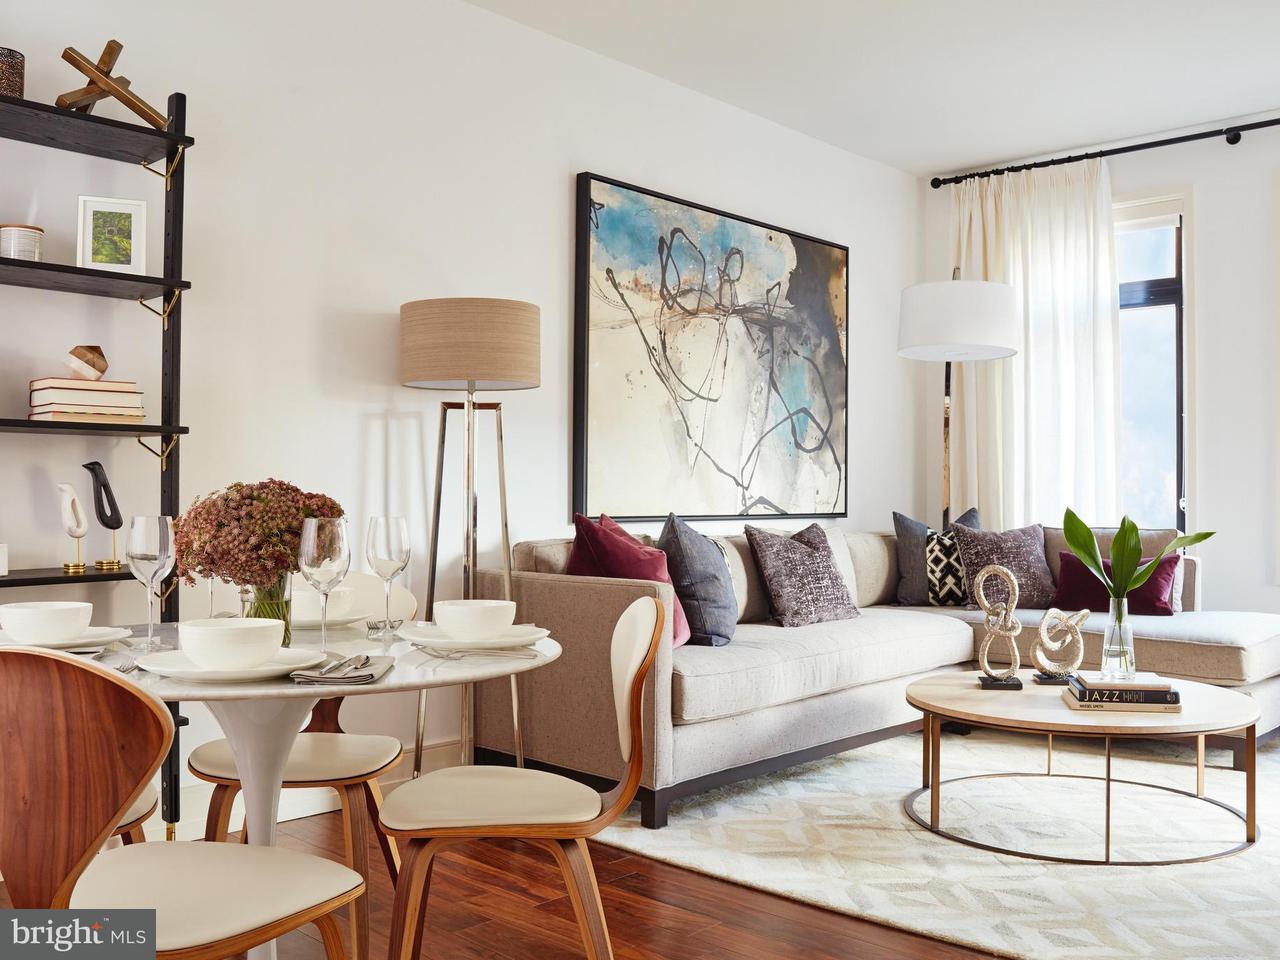 Condominium for Rent at 1310 U St NW #309 Washington, District Of Columbia 20009 United States